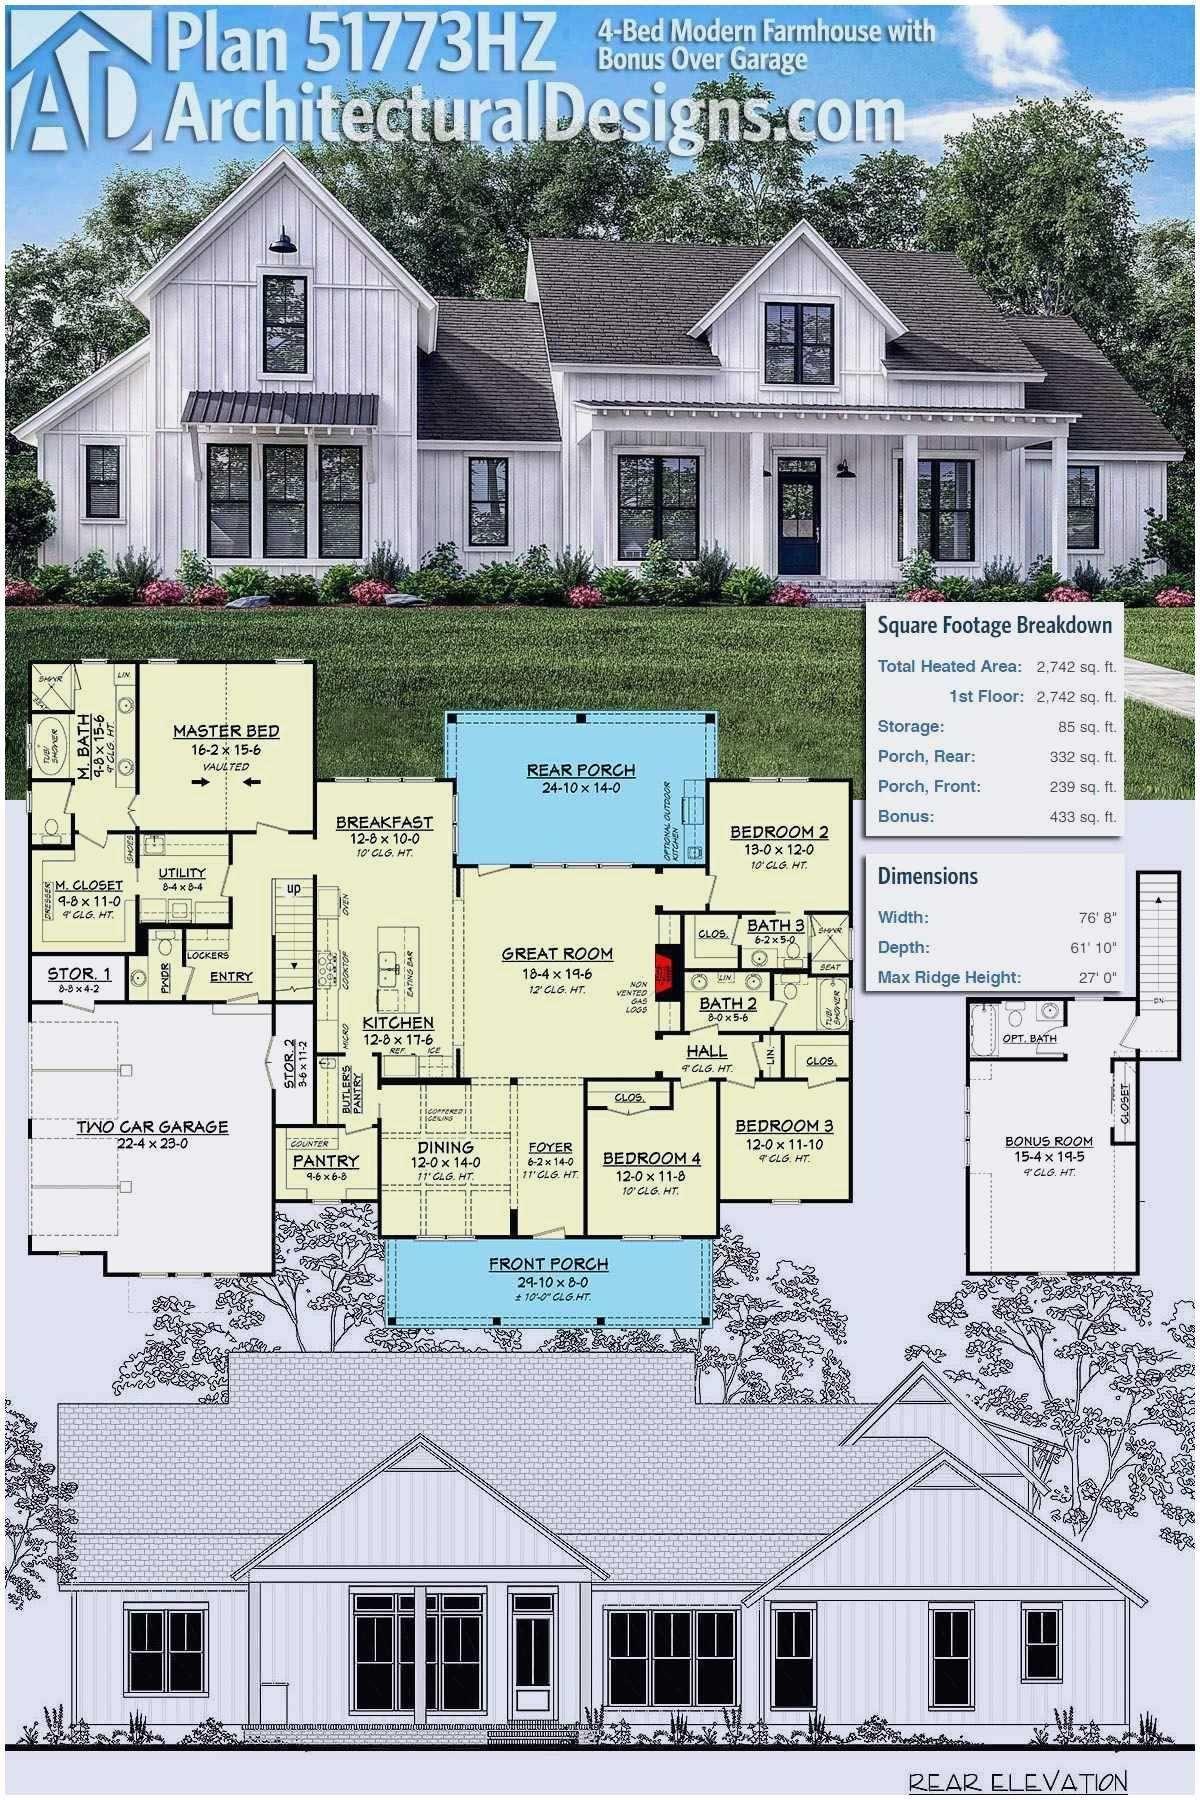 Open Concept Single Story Farmhouse Plans Fresh 31 Best E Story Farmhouse Plans With Modern Farmhouse Plans Modern Farmhouse Floorplan Modern Farmhouse Floors